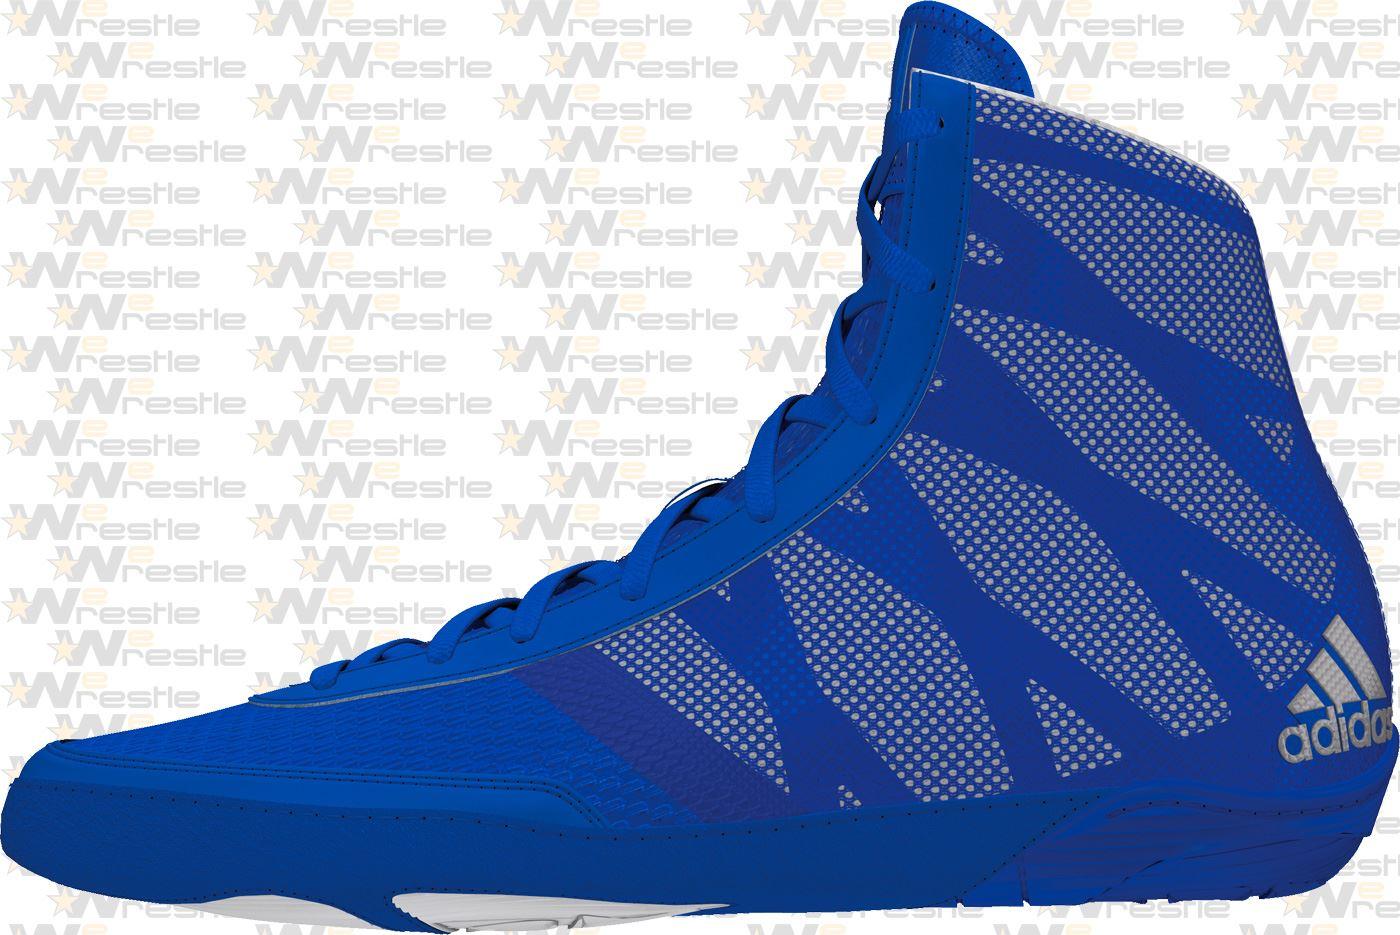 adidas Pretereo III Wrestling Shoes - Blue ...